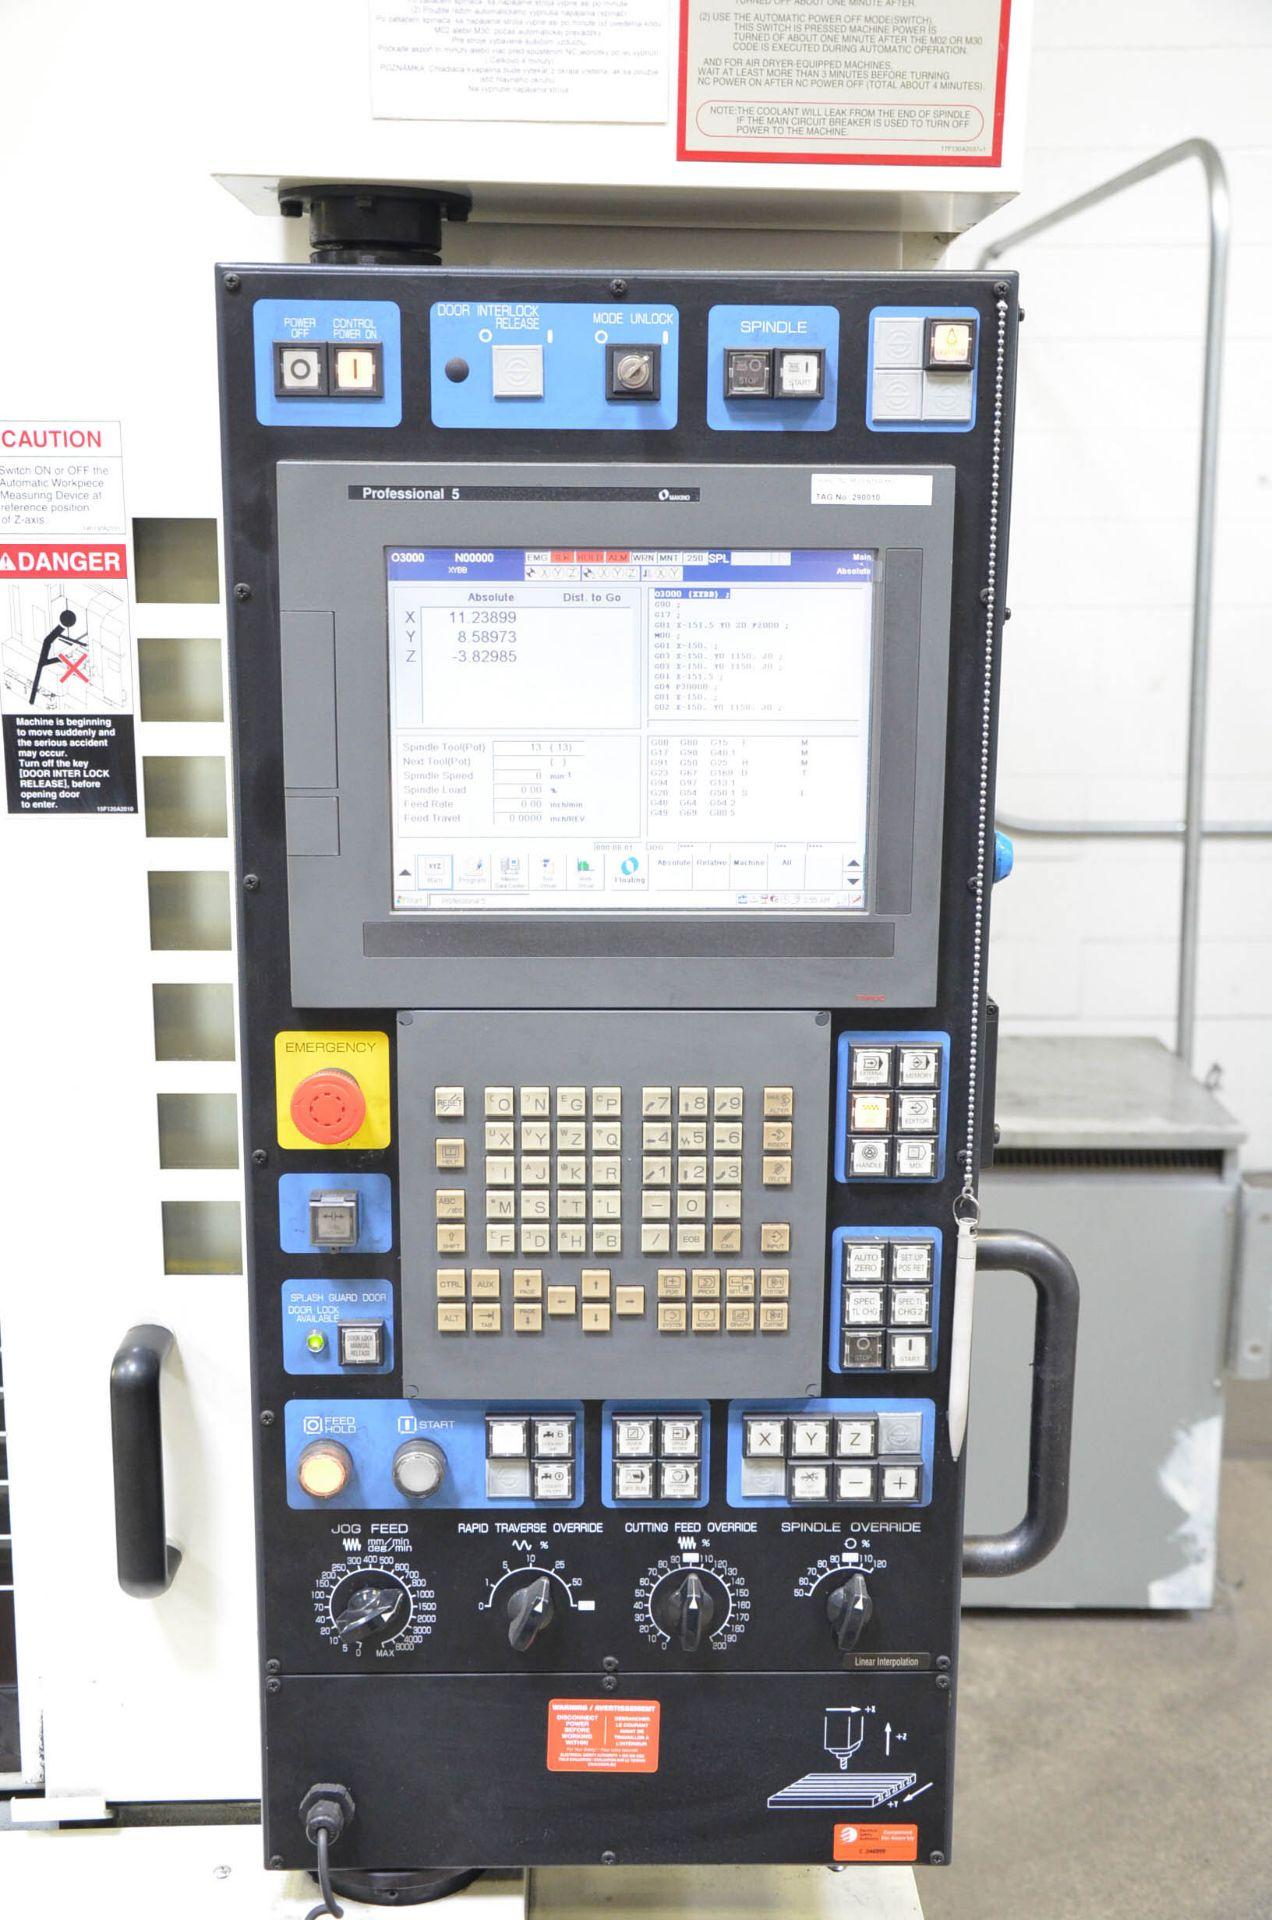 MAKINO (2008) V56 GRAPHITE CNC VERTICAL MACHINING CENTER WITH MAKINO PROFESSIONAL 5 TOUCHSCREEN - Image 8 of 10